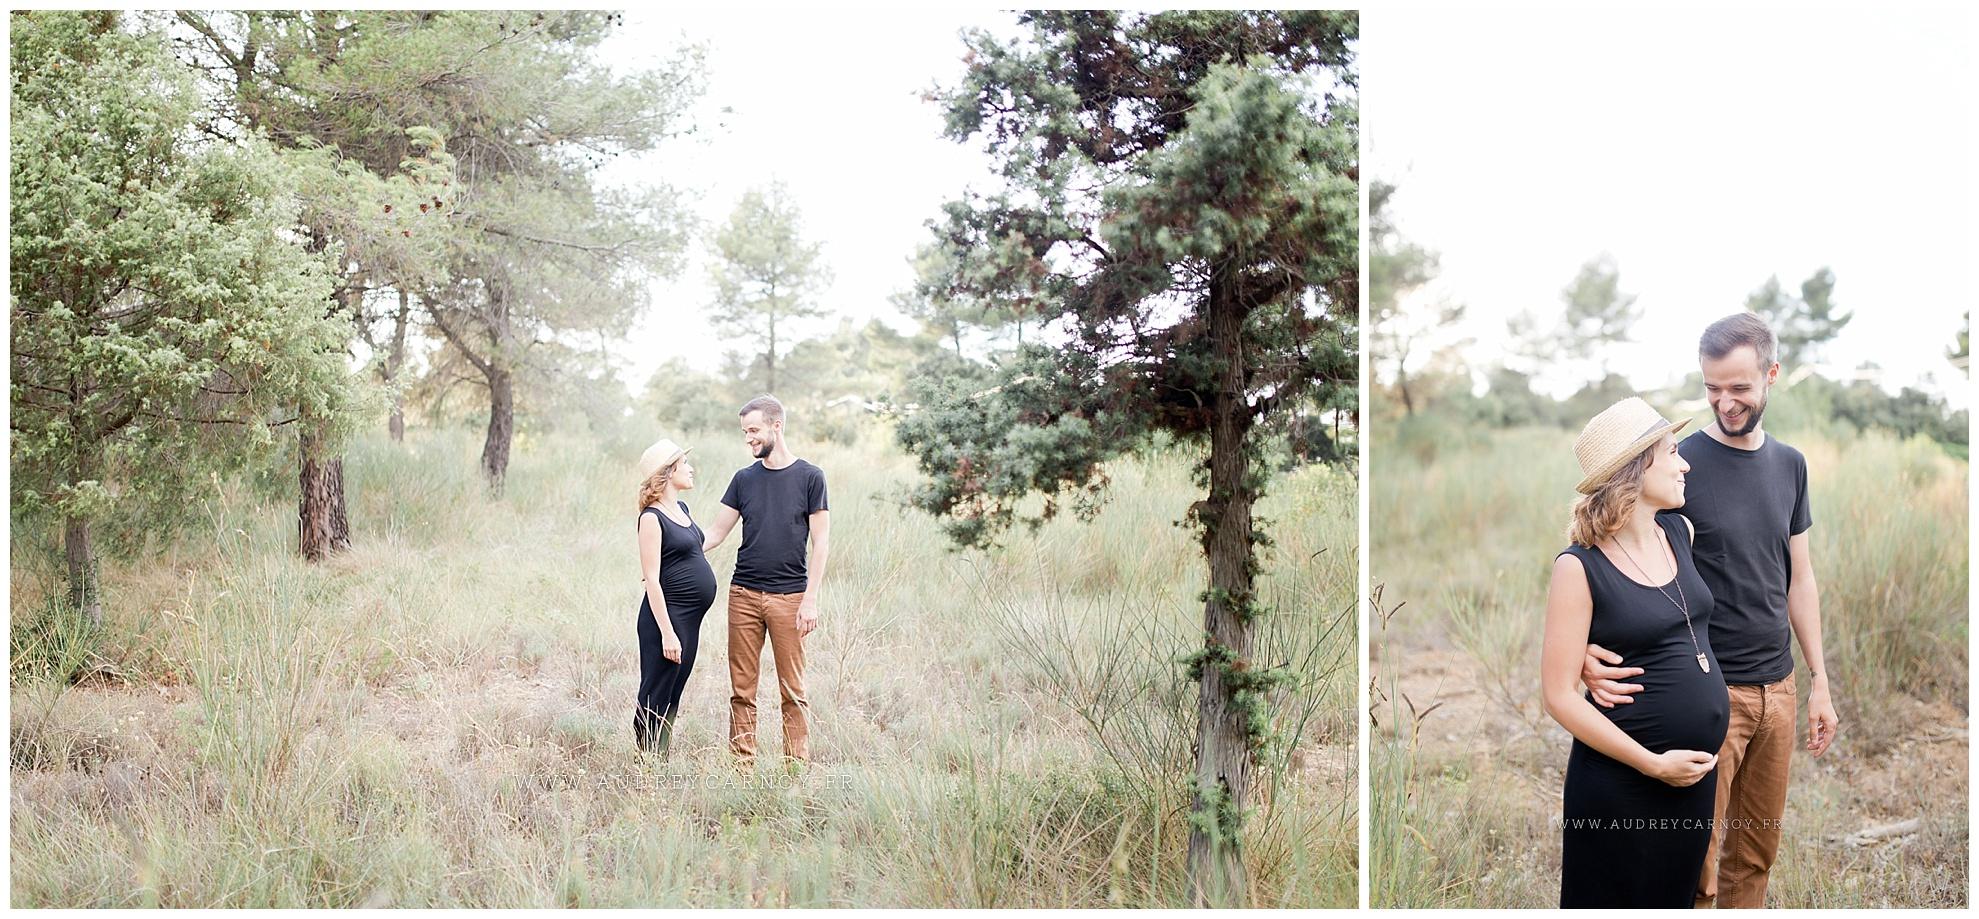 Seance grossesse Provence - Pertuis | Audrey & Jerome 3